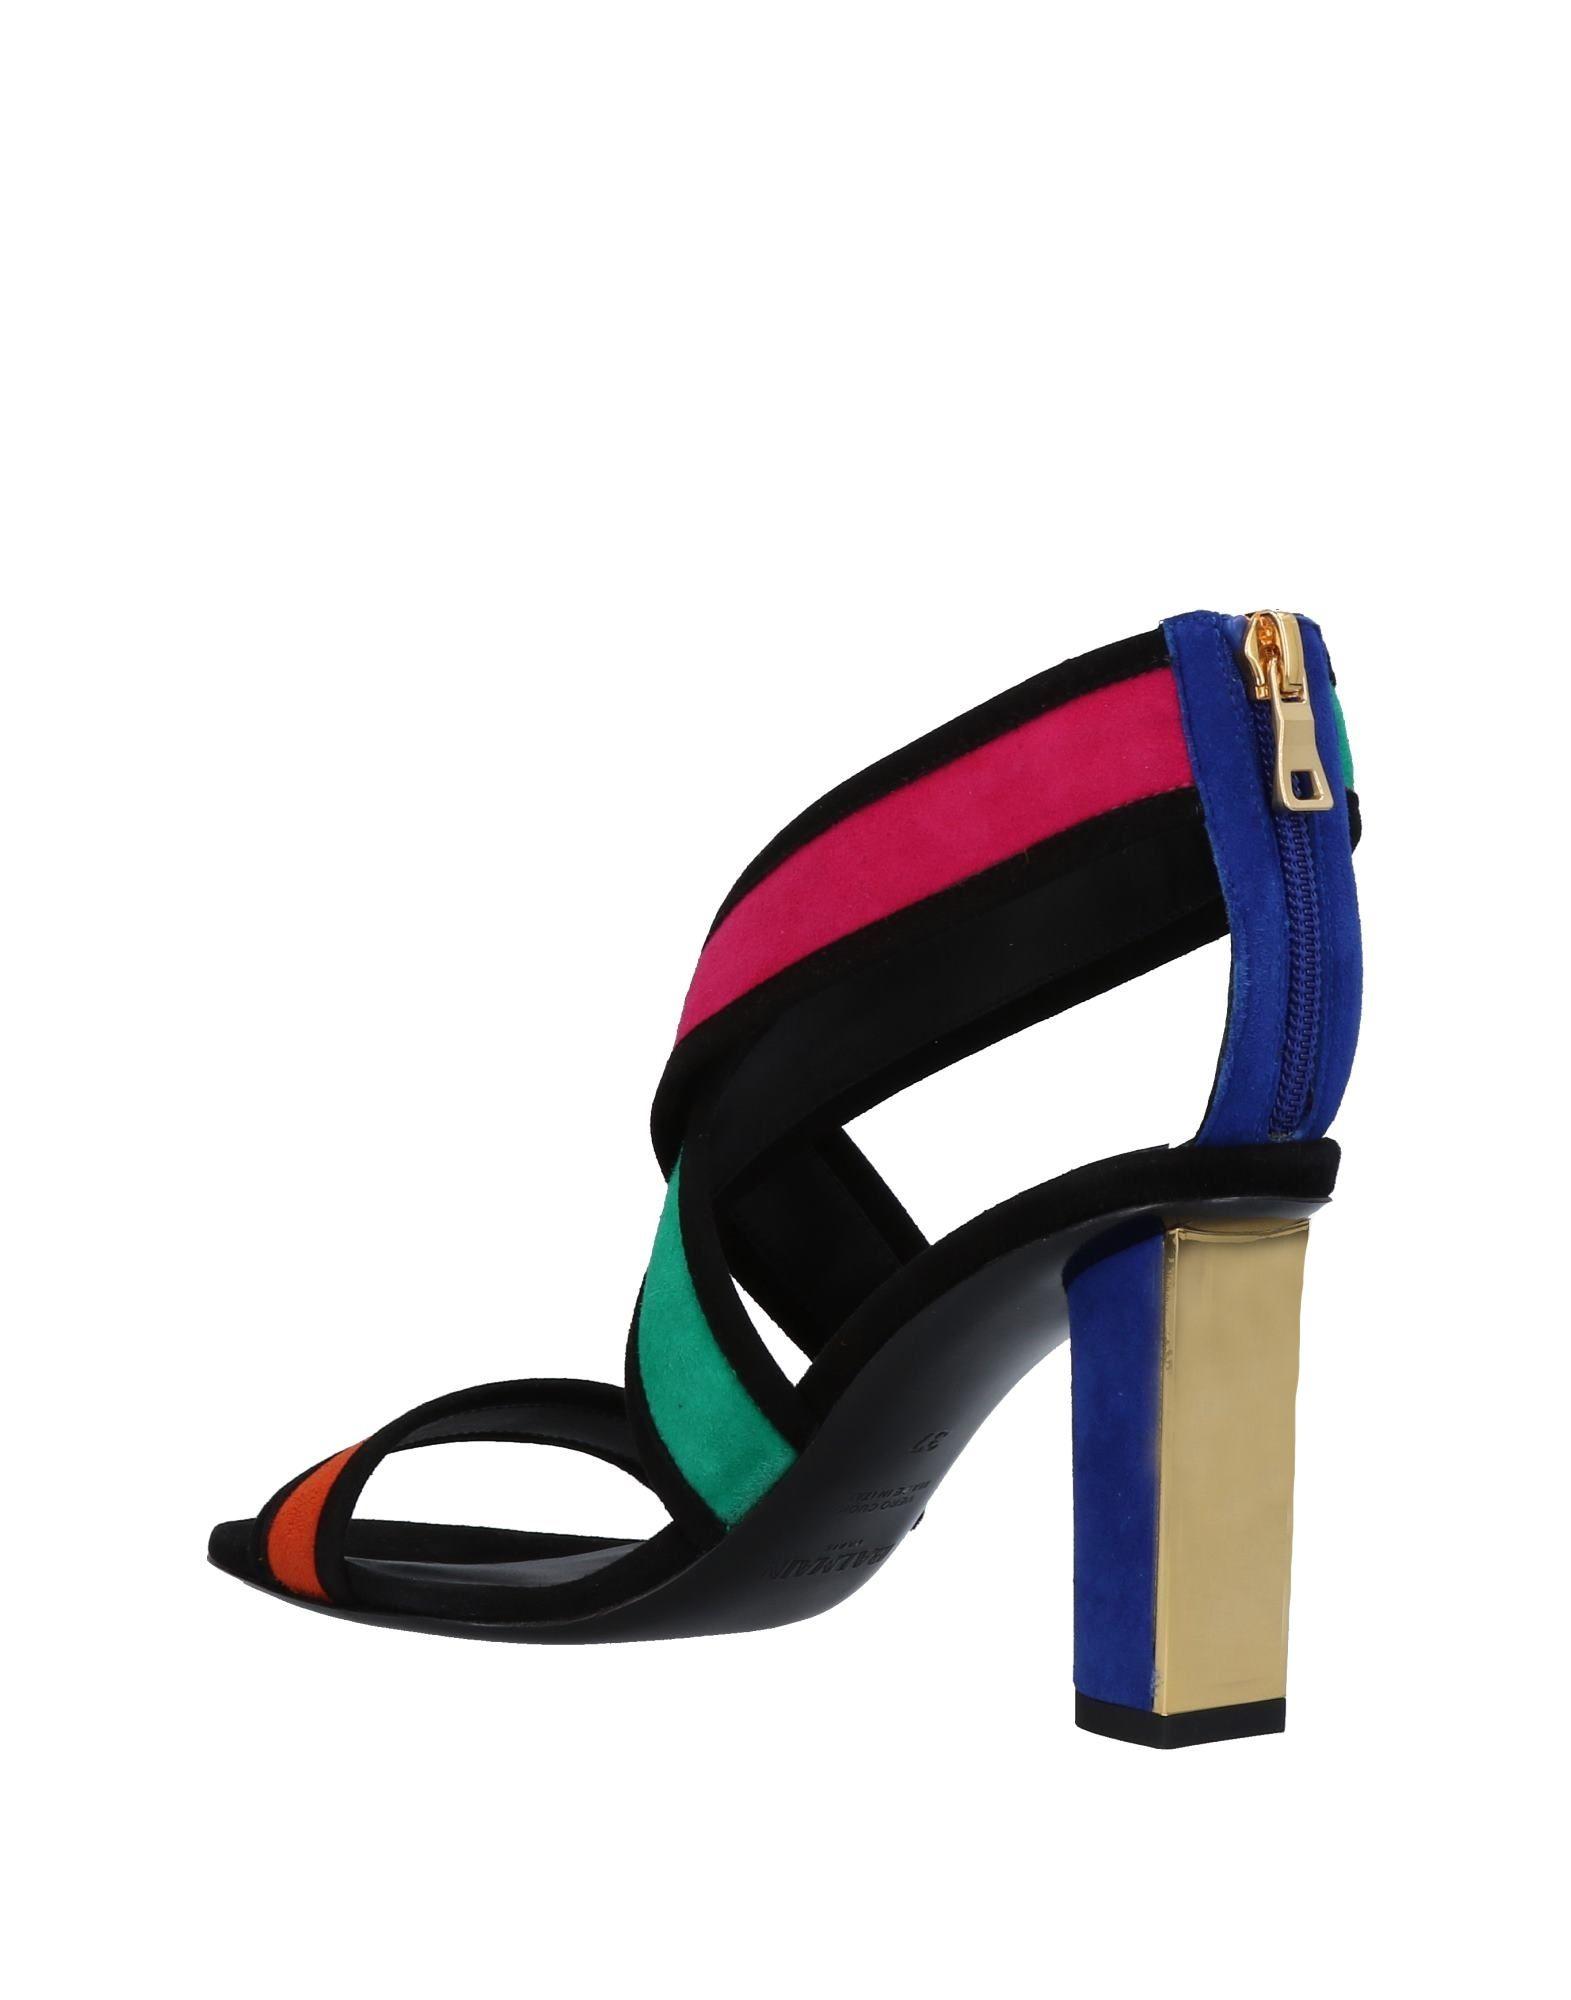 Sandales Balmain Femme - Sandales Balmain sur